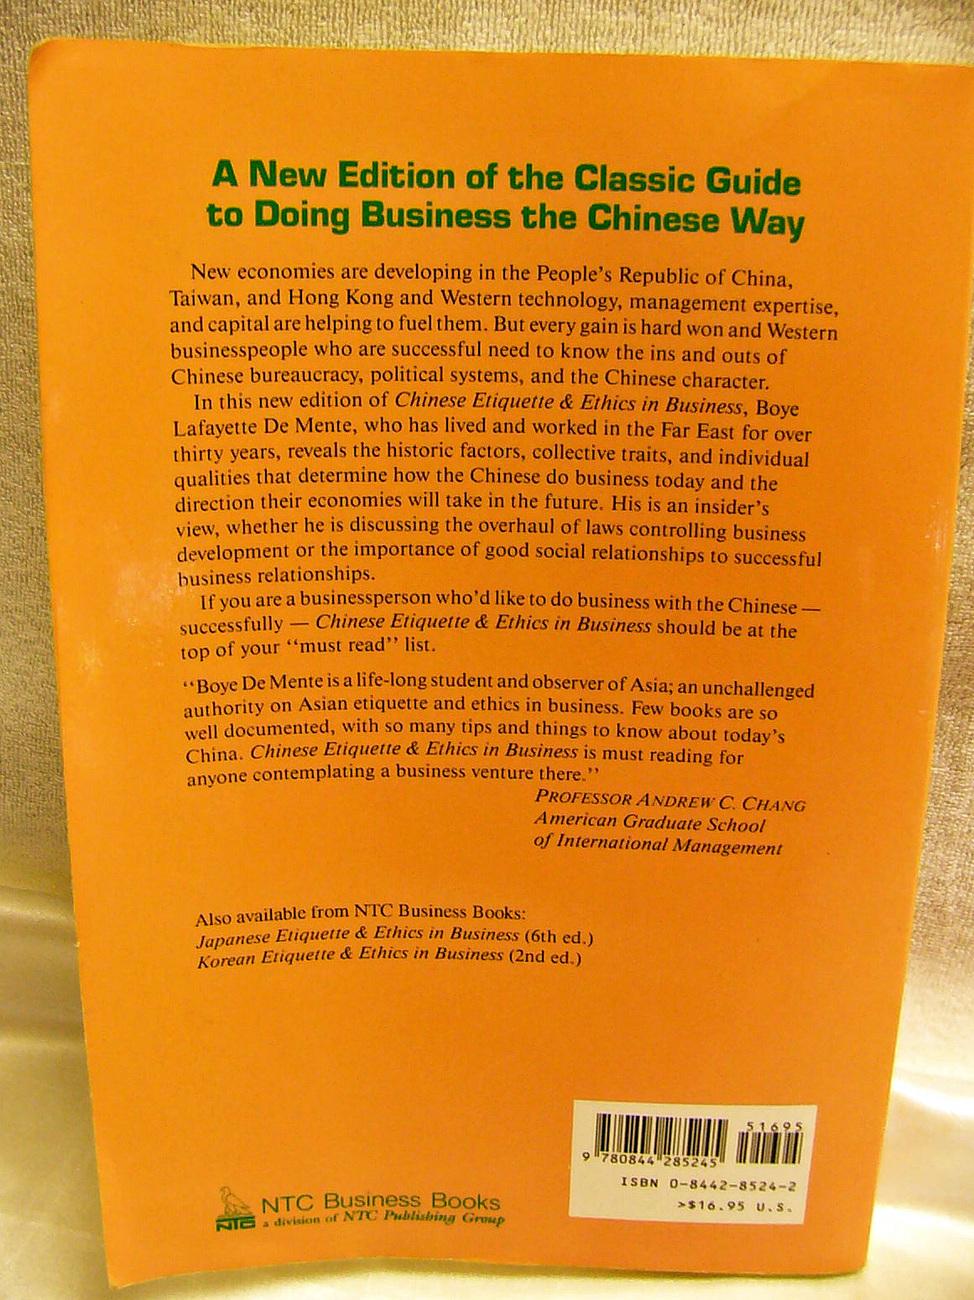 Chinese Etiquette & Ethics In Business De Mente